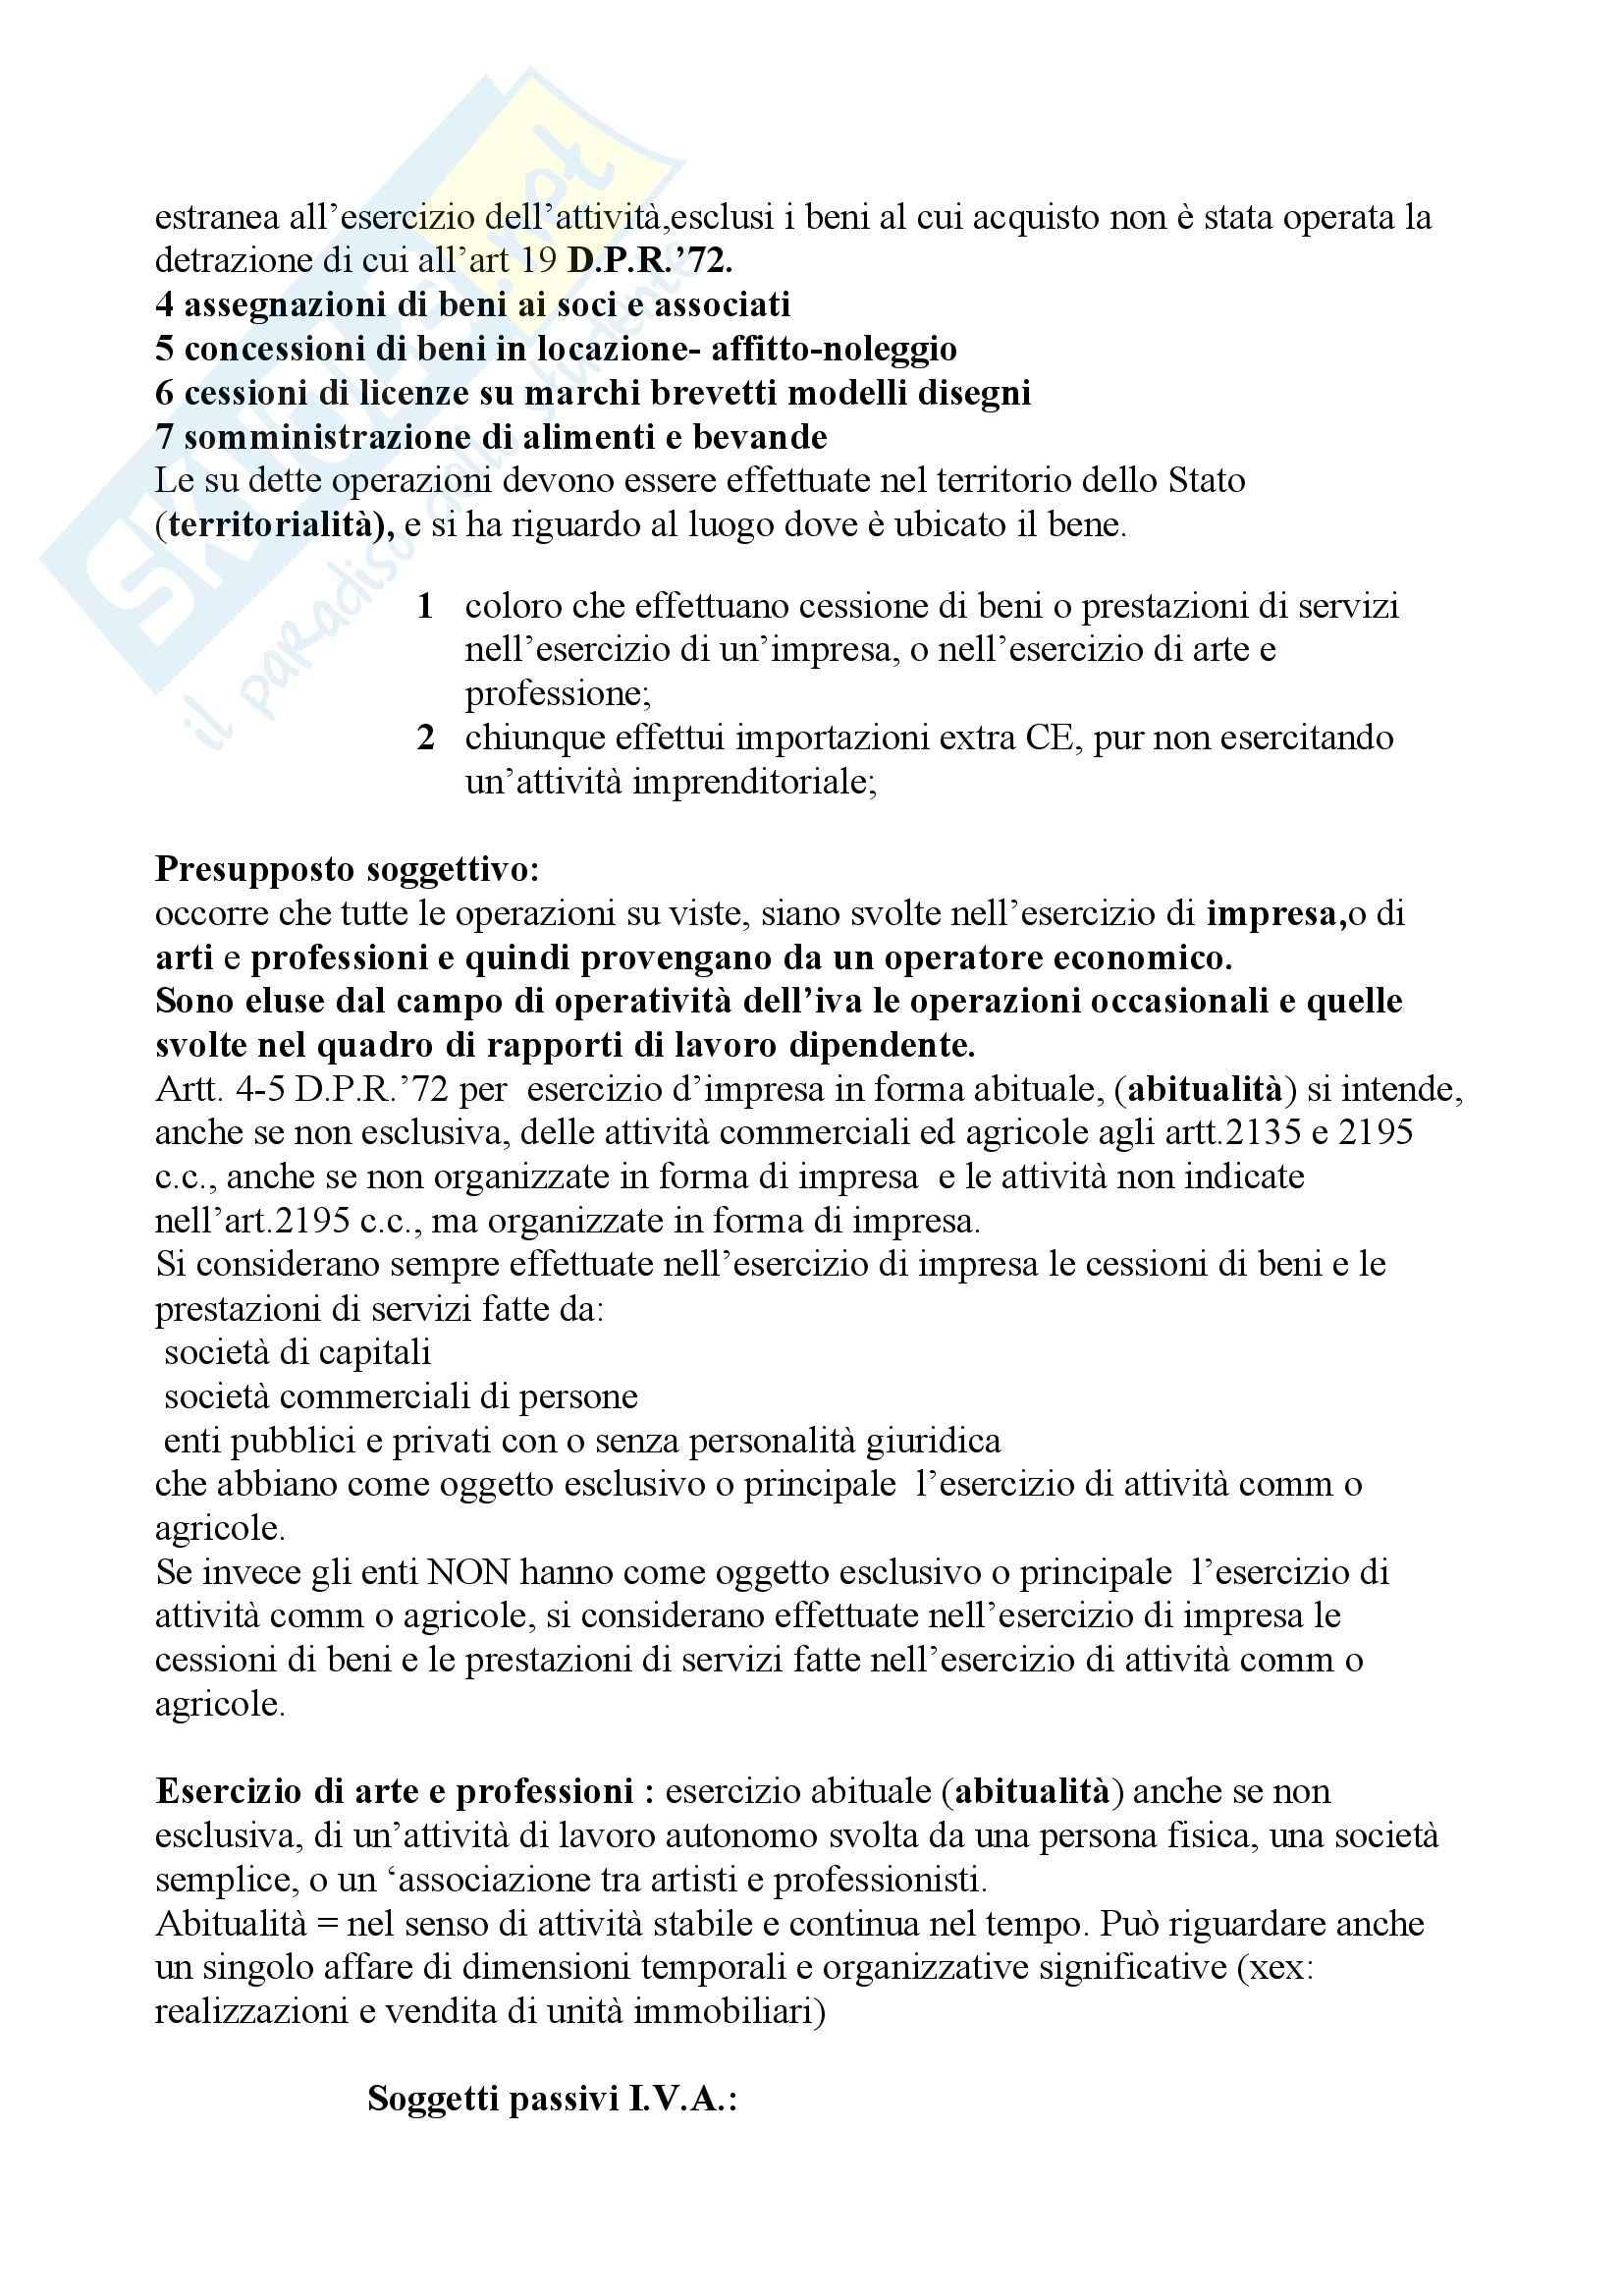 Economia - IVA - Appunti Pag. 2